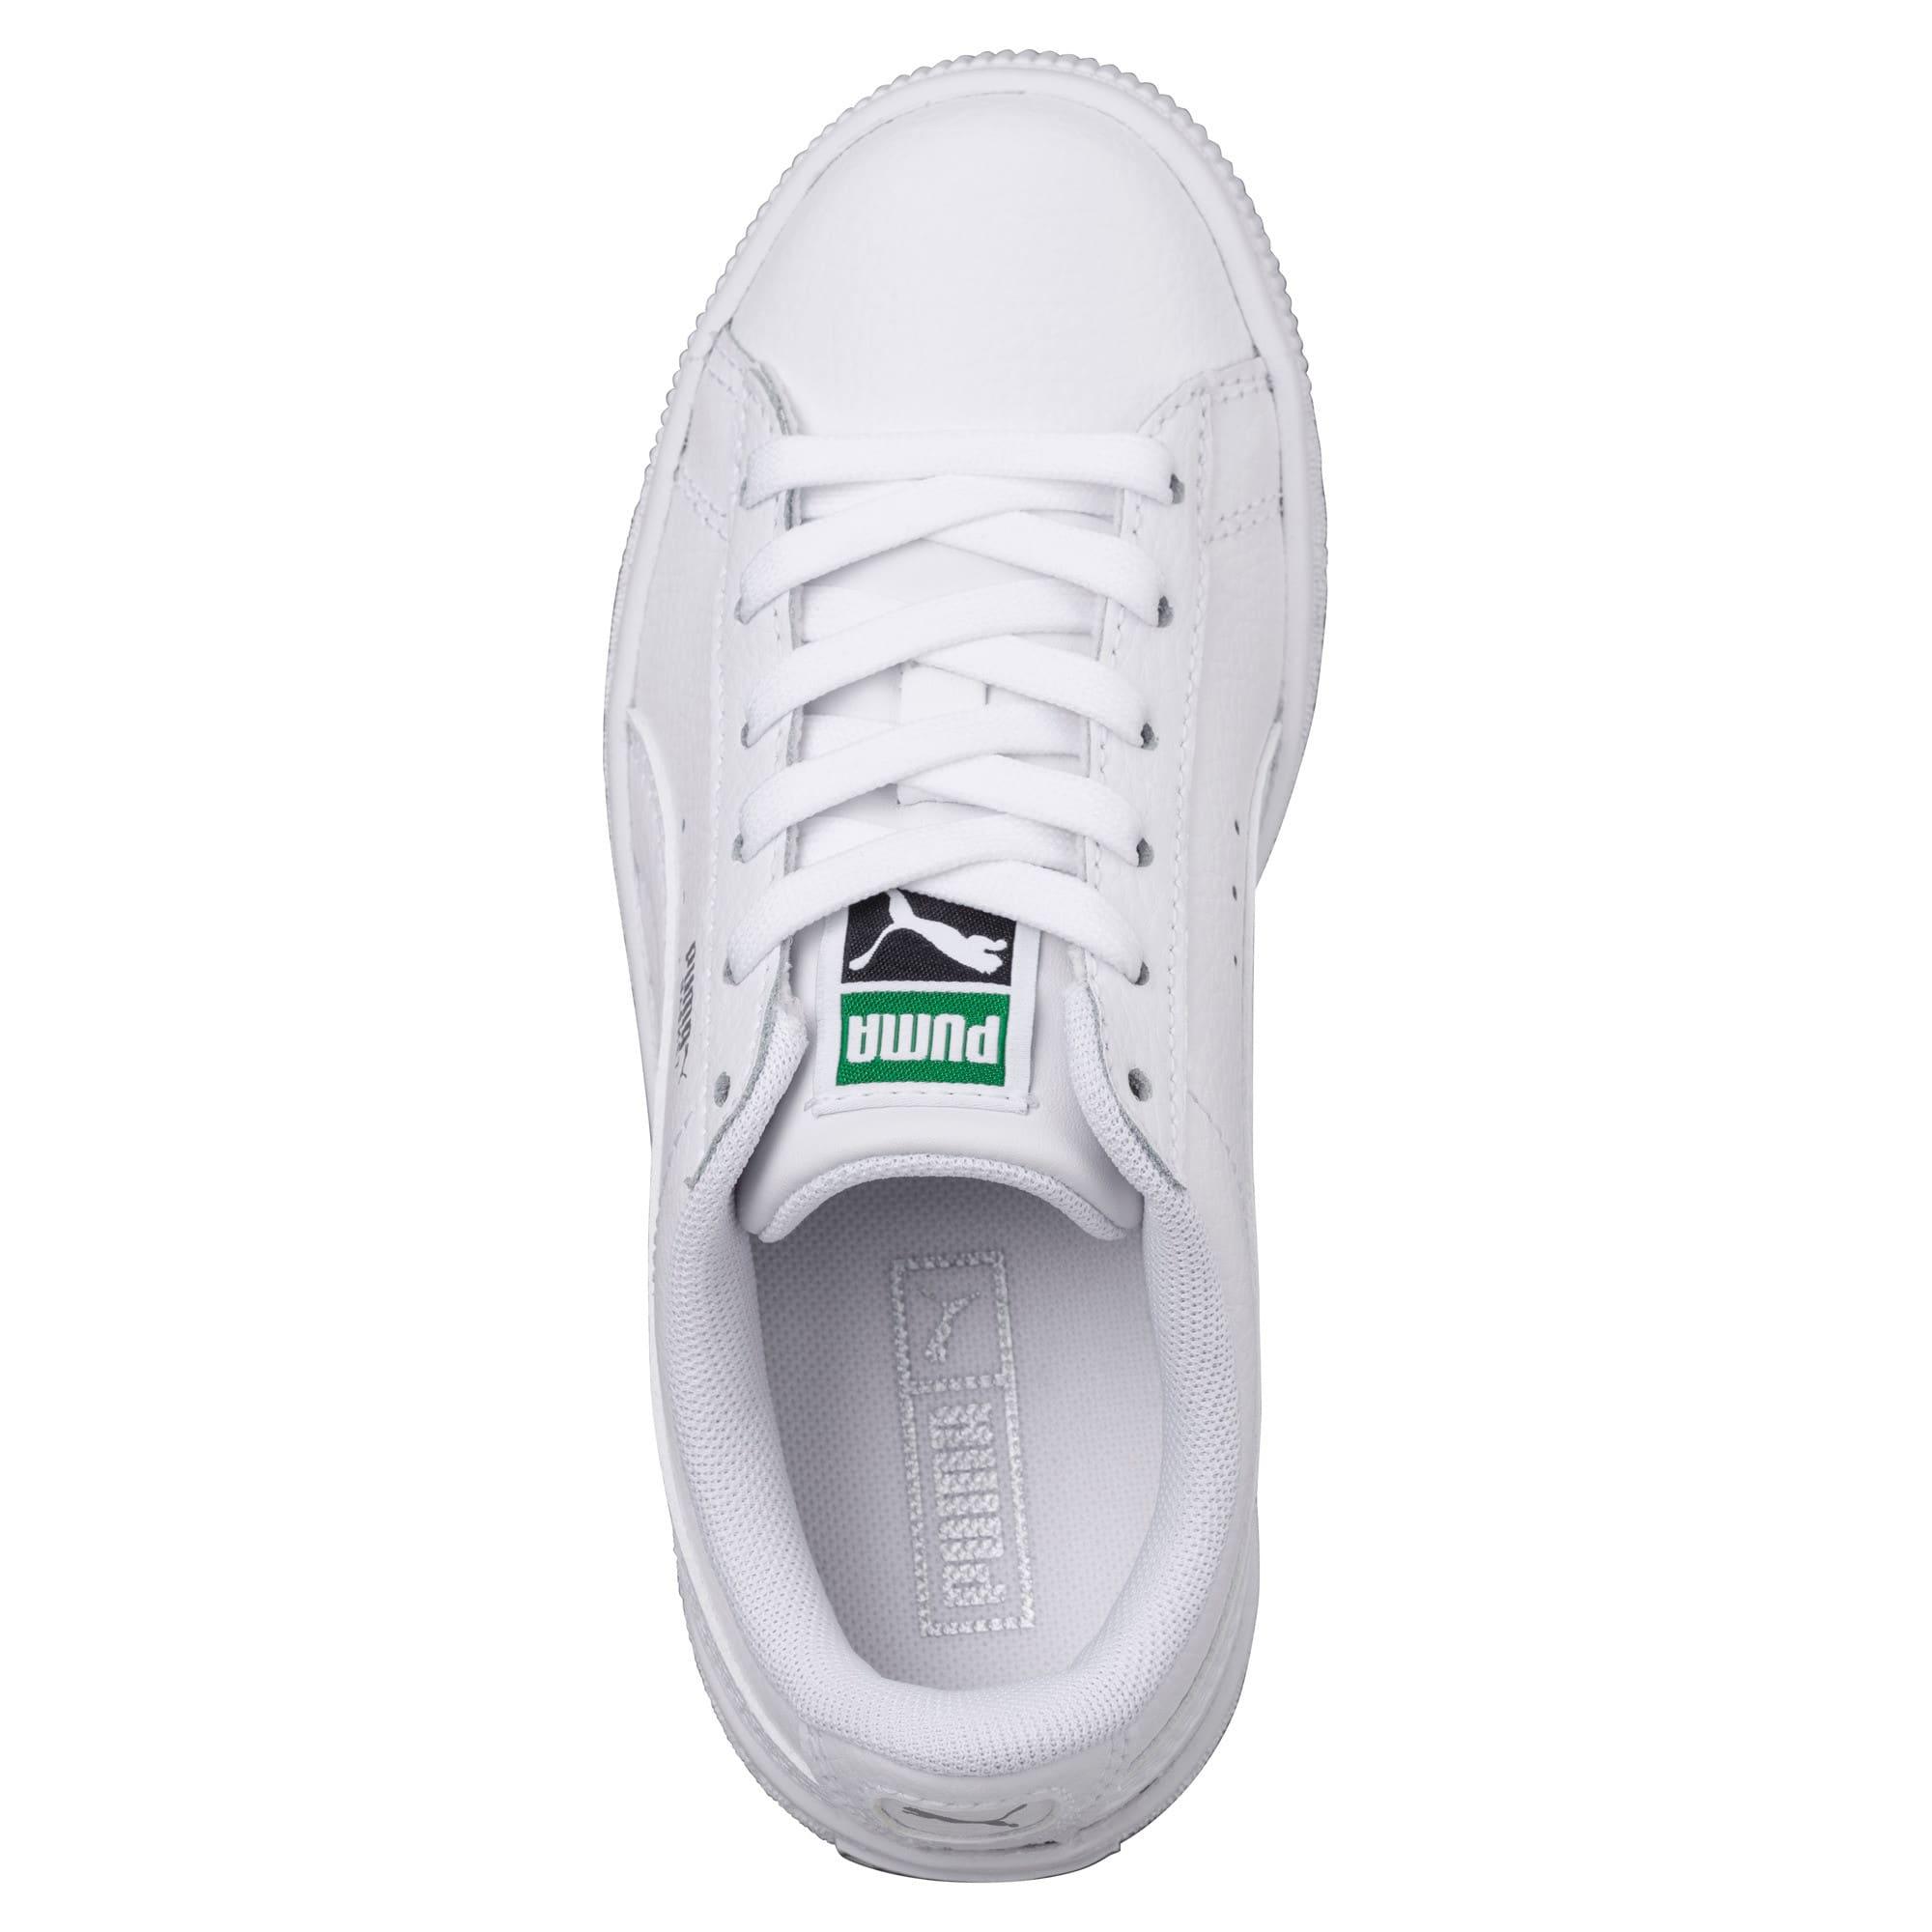 Thumbnail 5 of Basket Classic Little Kids' Shoes, Puma White-Puma White, medium